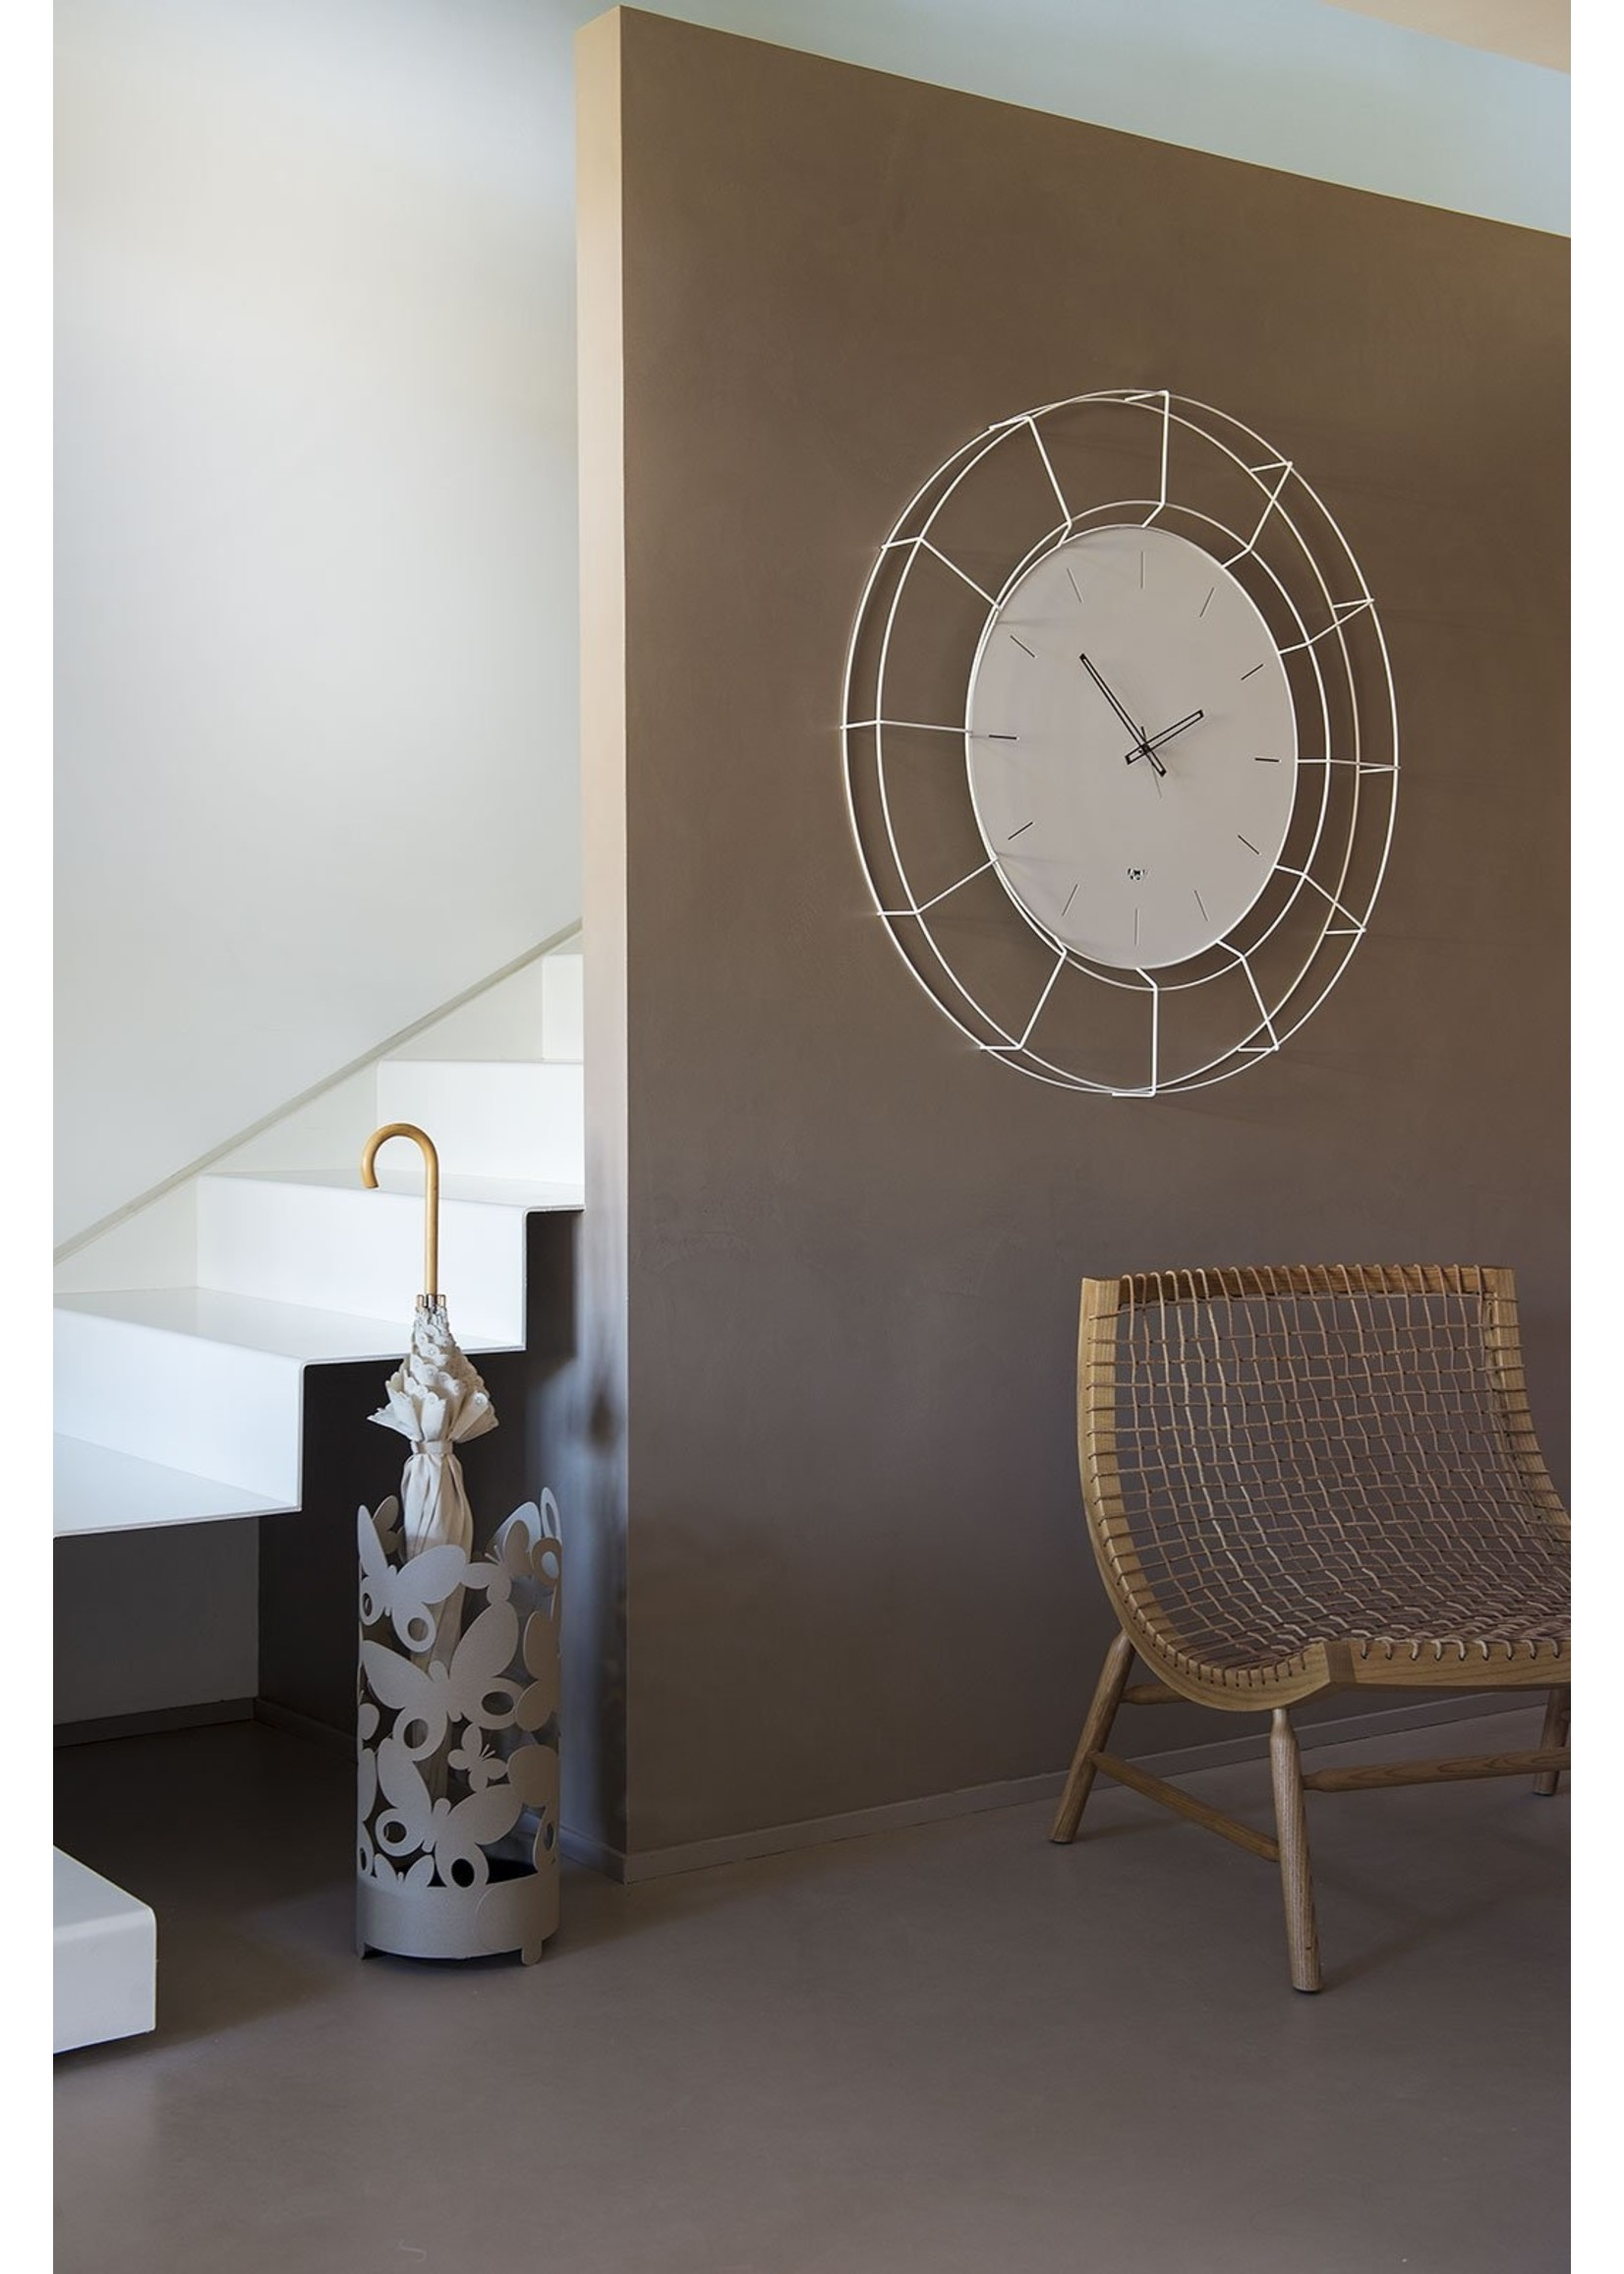 Arti & Mestieri Wandklok Italiaans Design Nudo Small 2684 c71 black